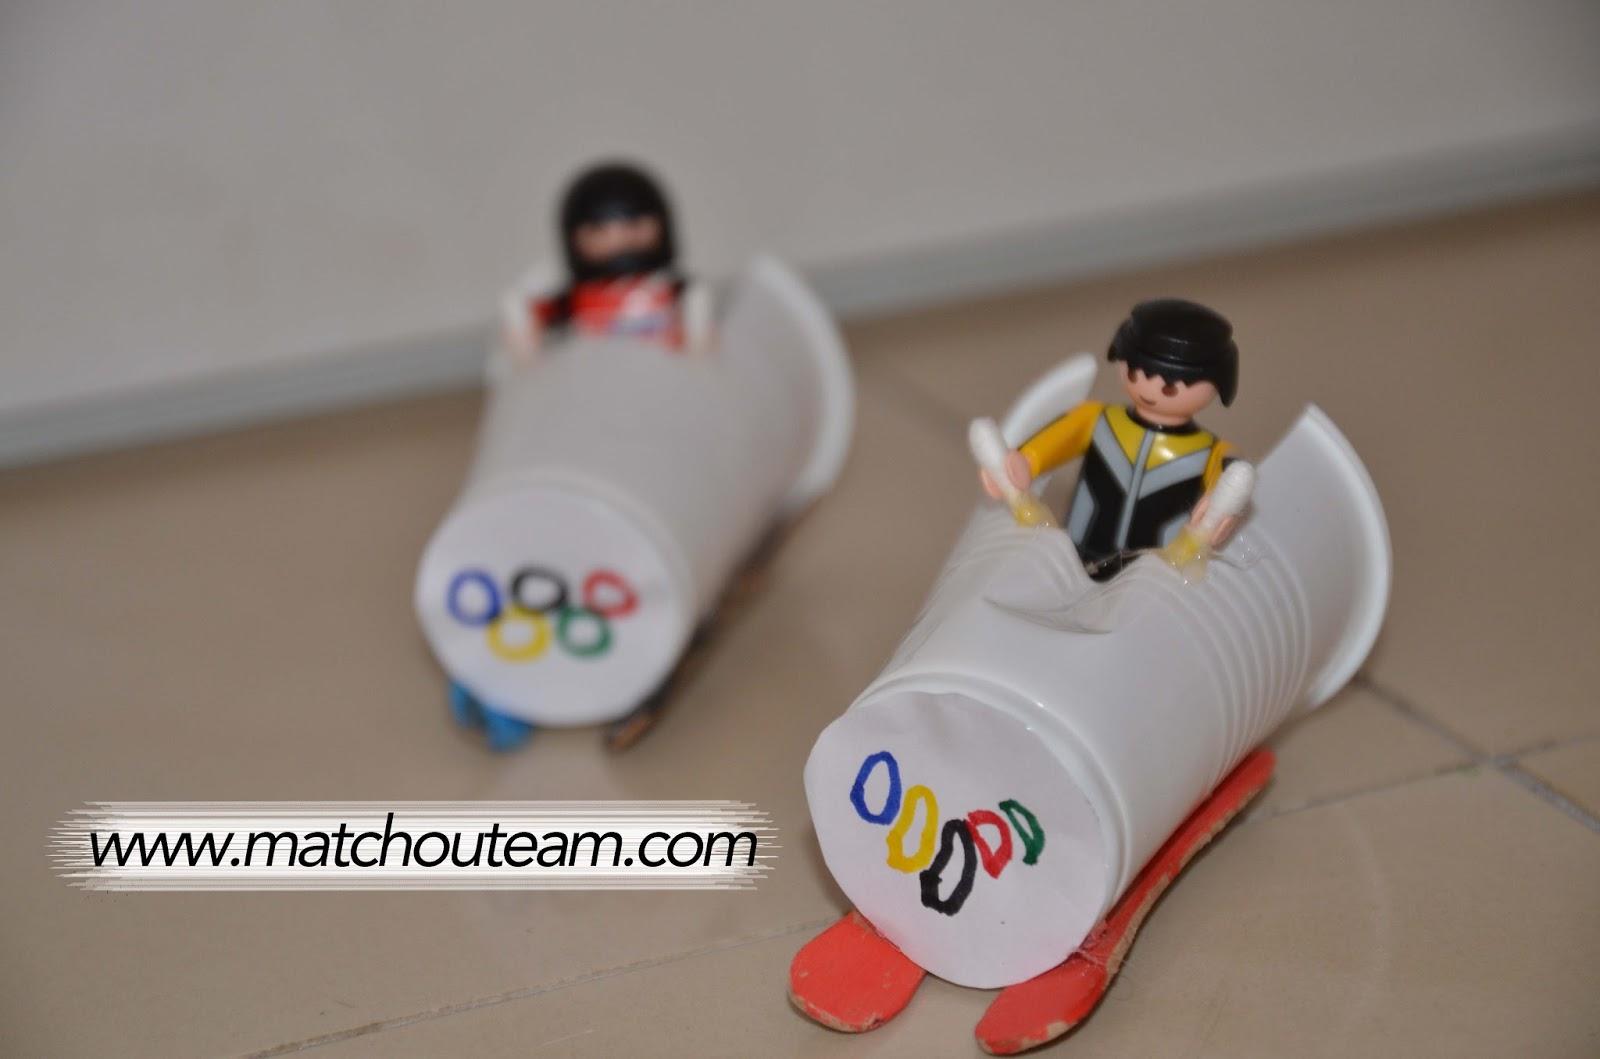 bobsleigh olympique à fabriquer